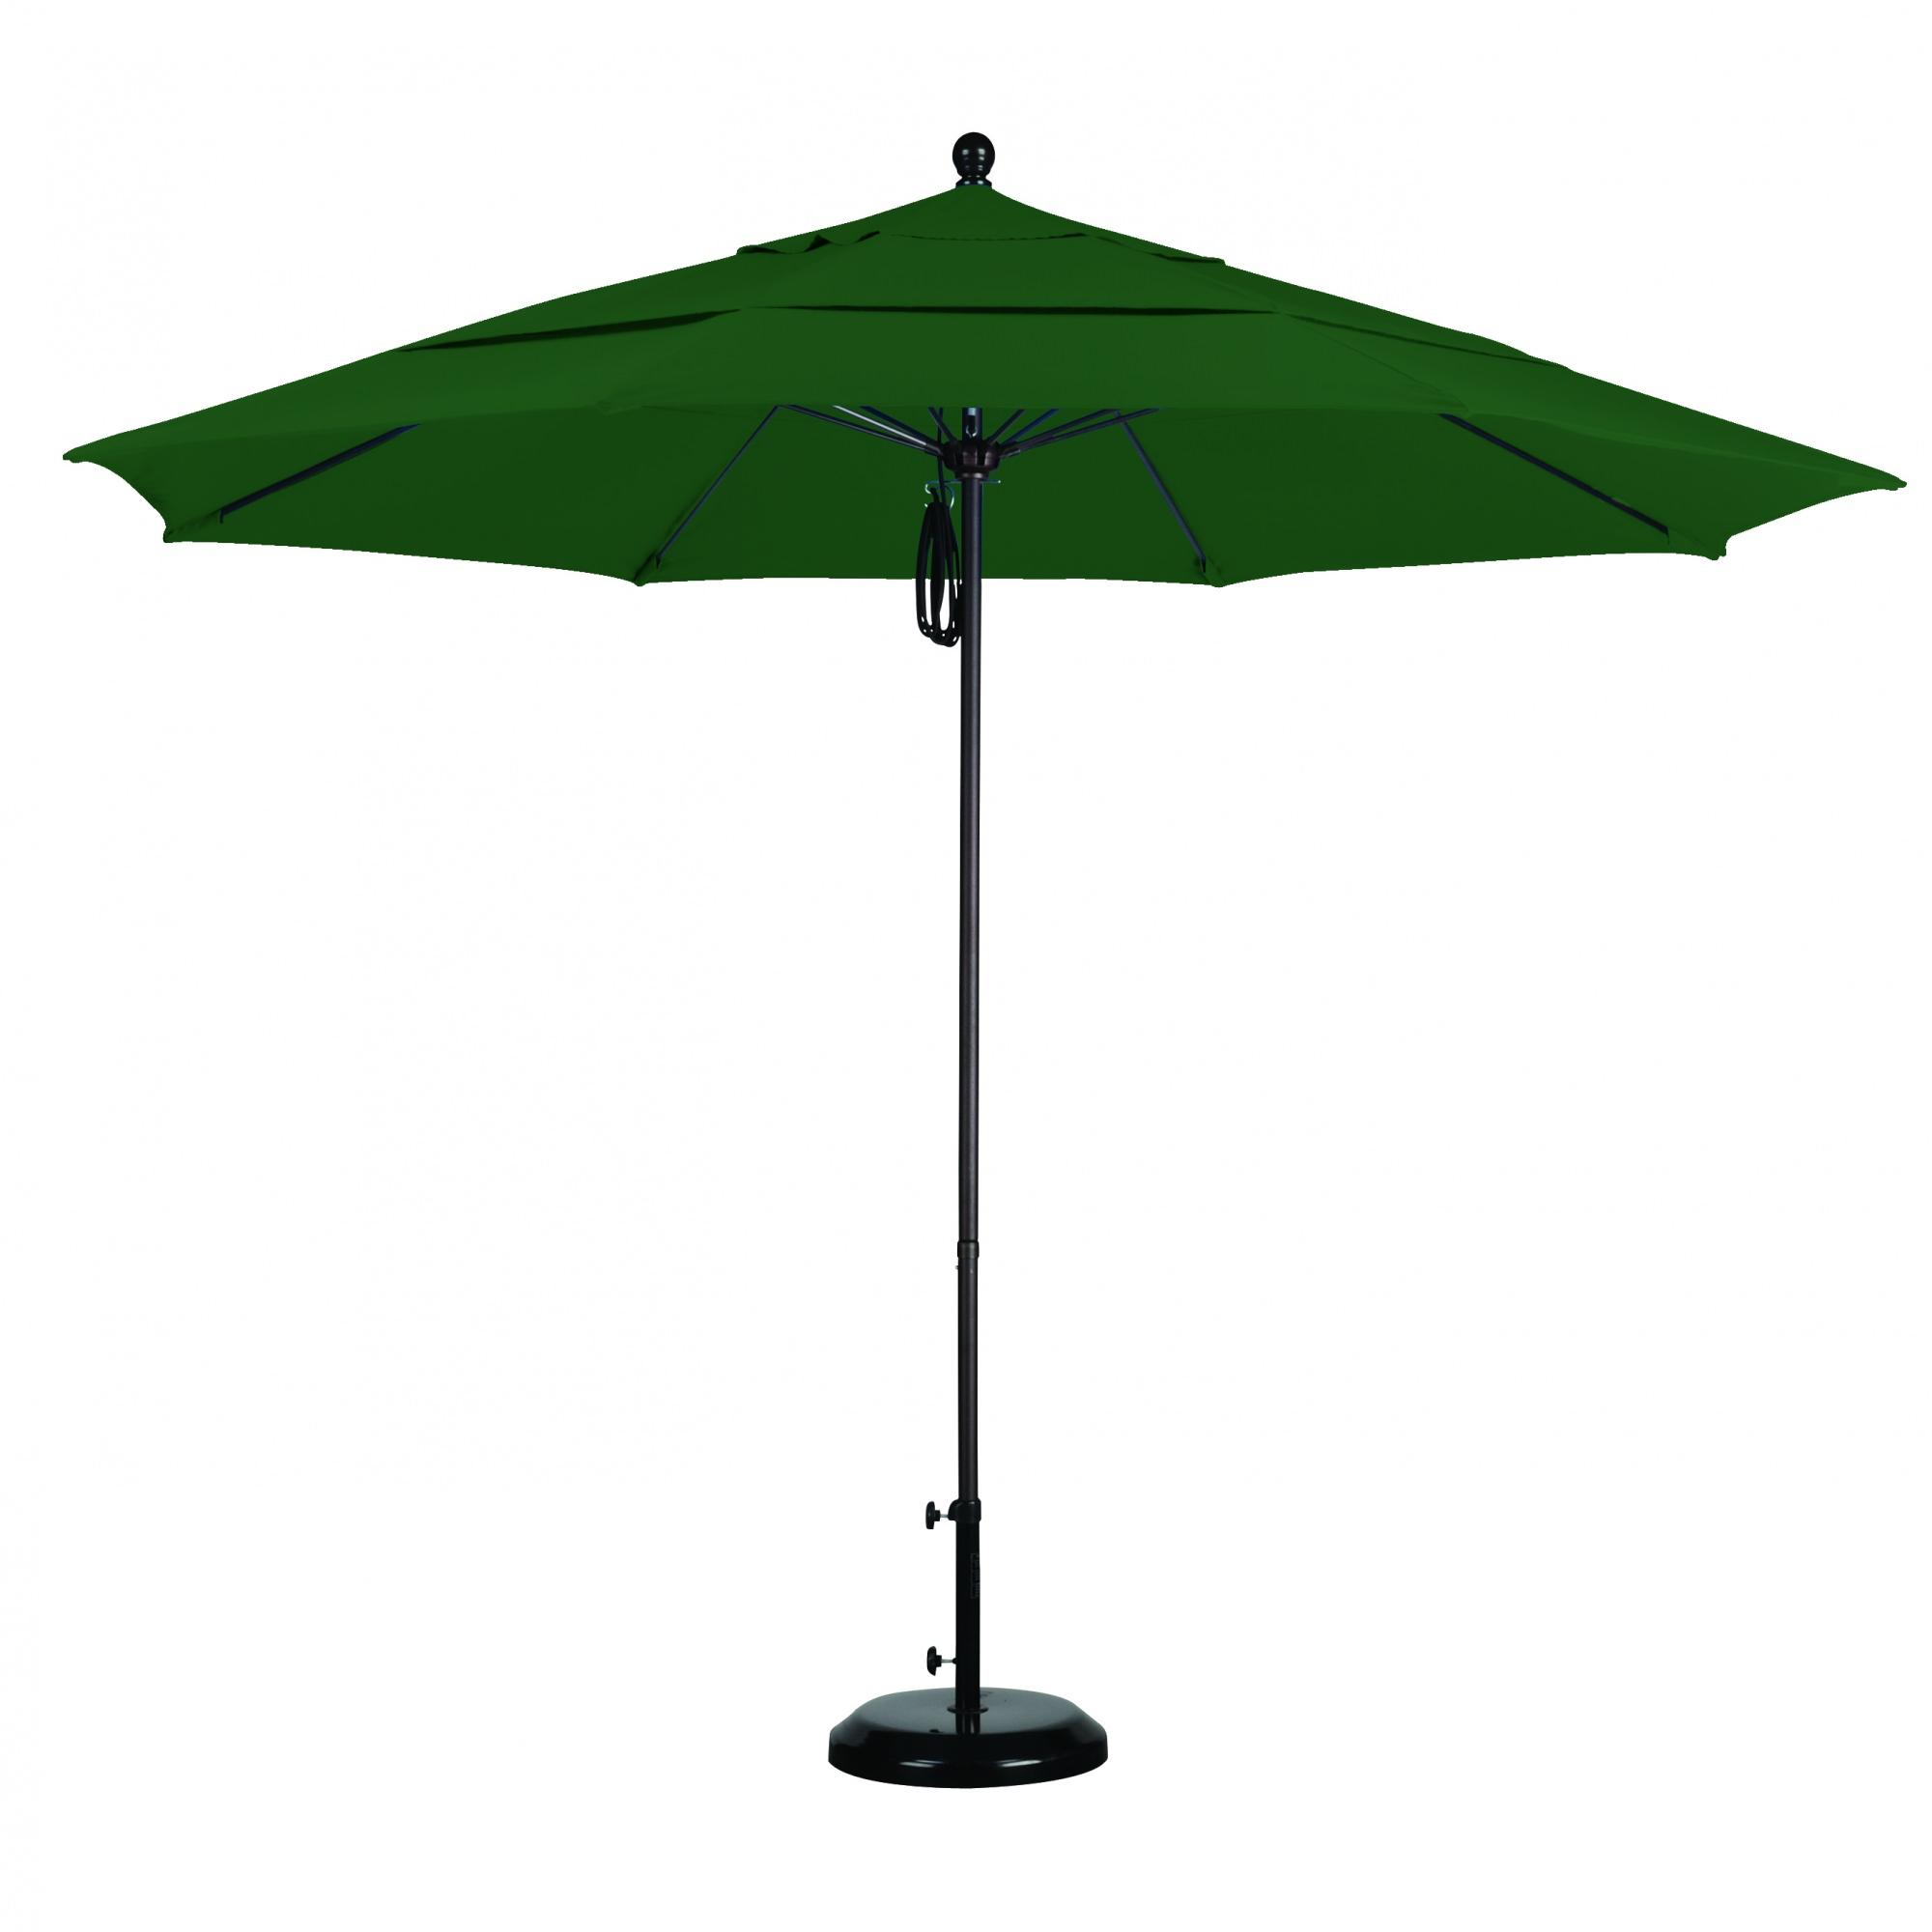 11 Ft Sunbrella Pulley Patio Umbrella with Bronze Pole